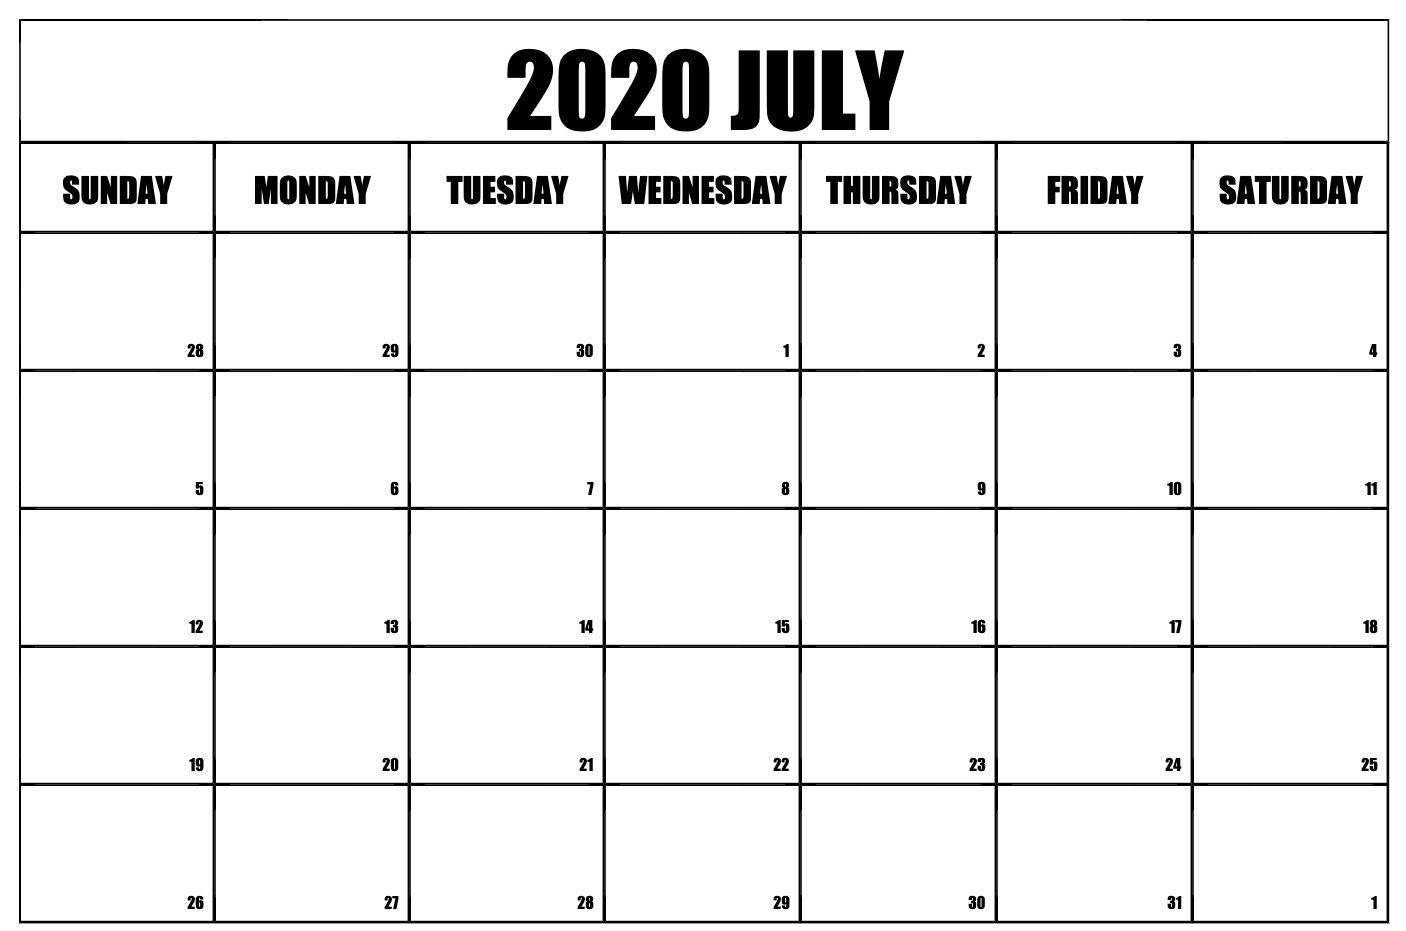 Free Printable July 2020 Calendar | Free Printable Calendar with 2020 Printable Monthly Calendar Free Vertex